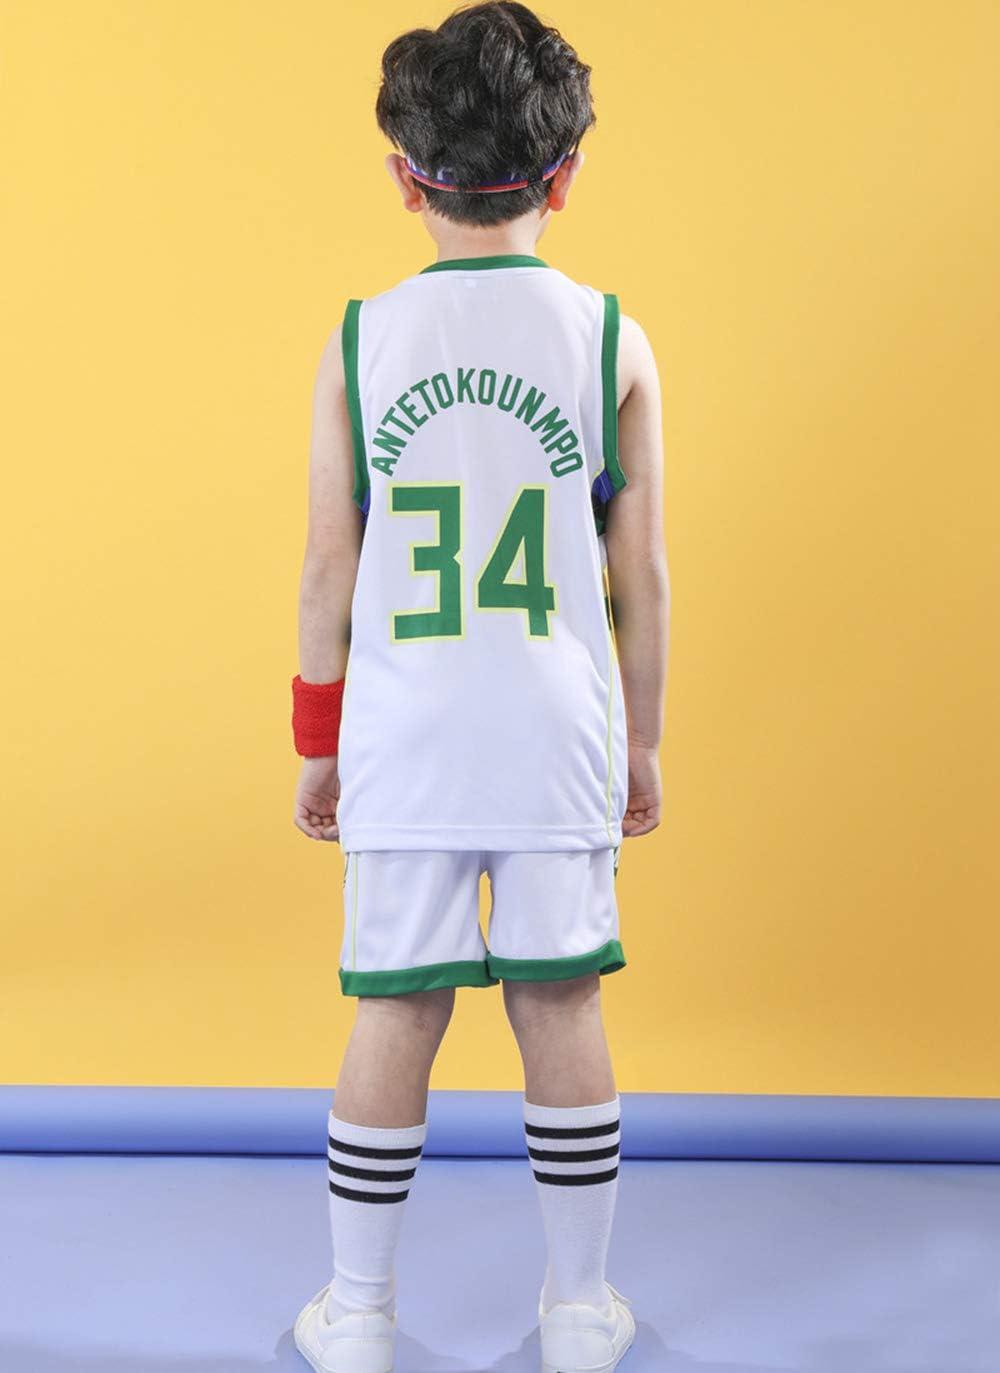 Gar/çons Filles Maillots De Basketball Bucks 34# Antetokounmpo Short de Basketball Retro Maillots d/ét/é Uniforme de Basket-Ball Gilets /& Shorts